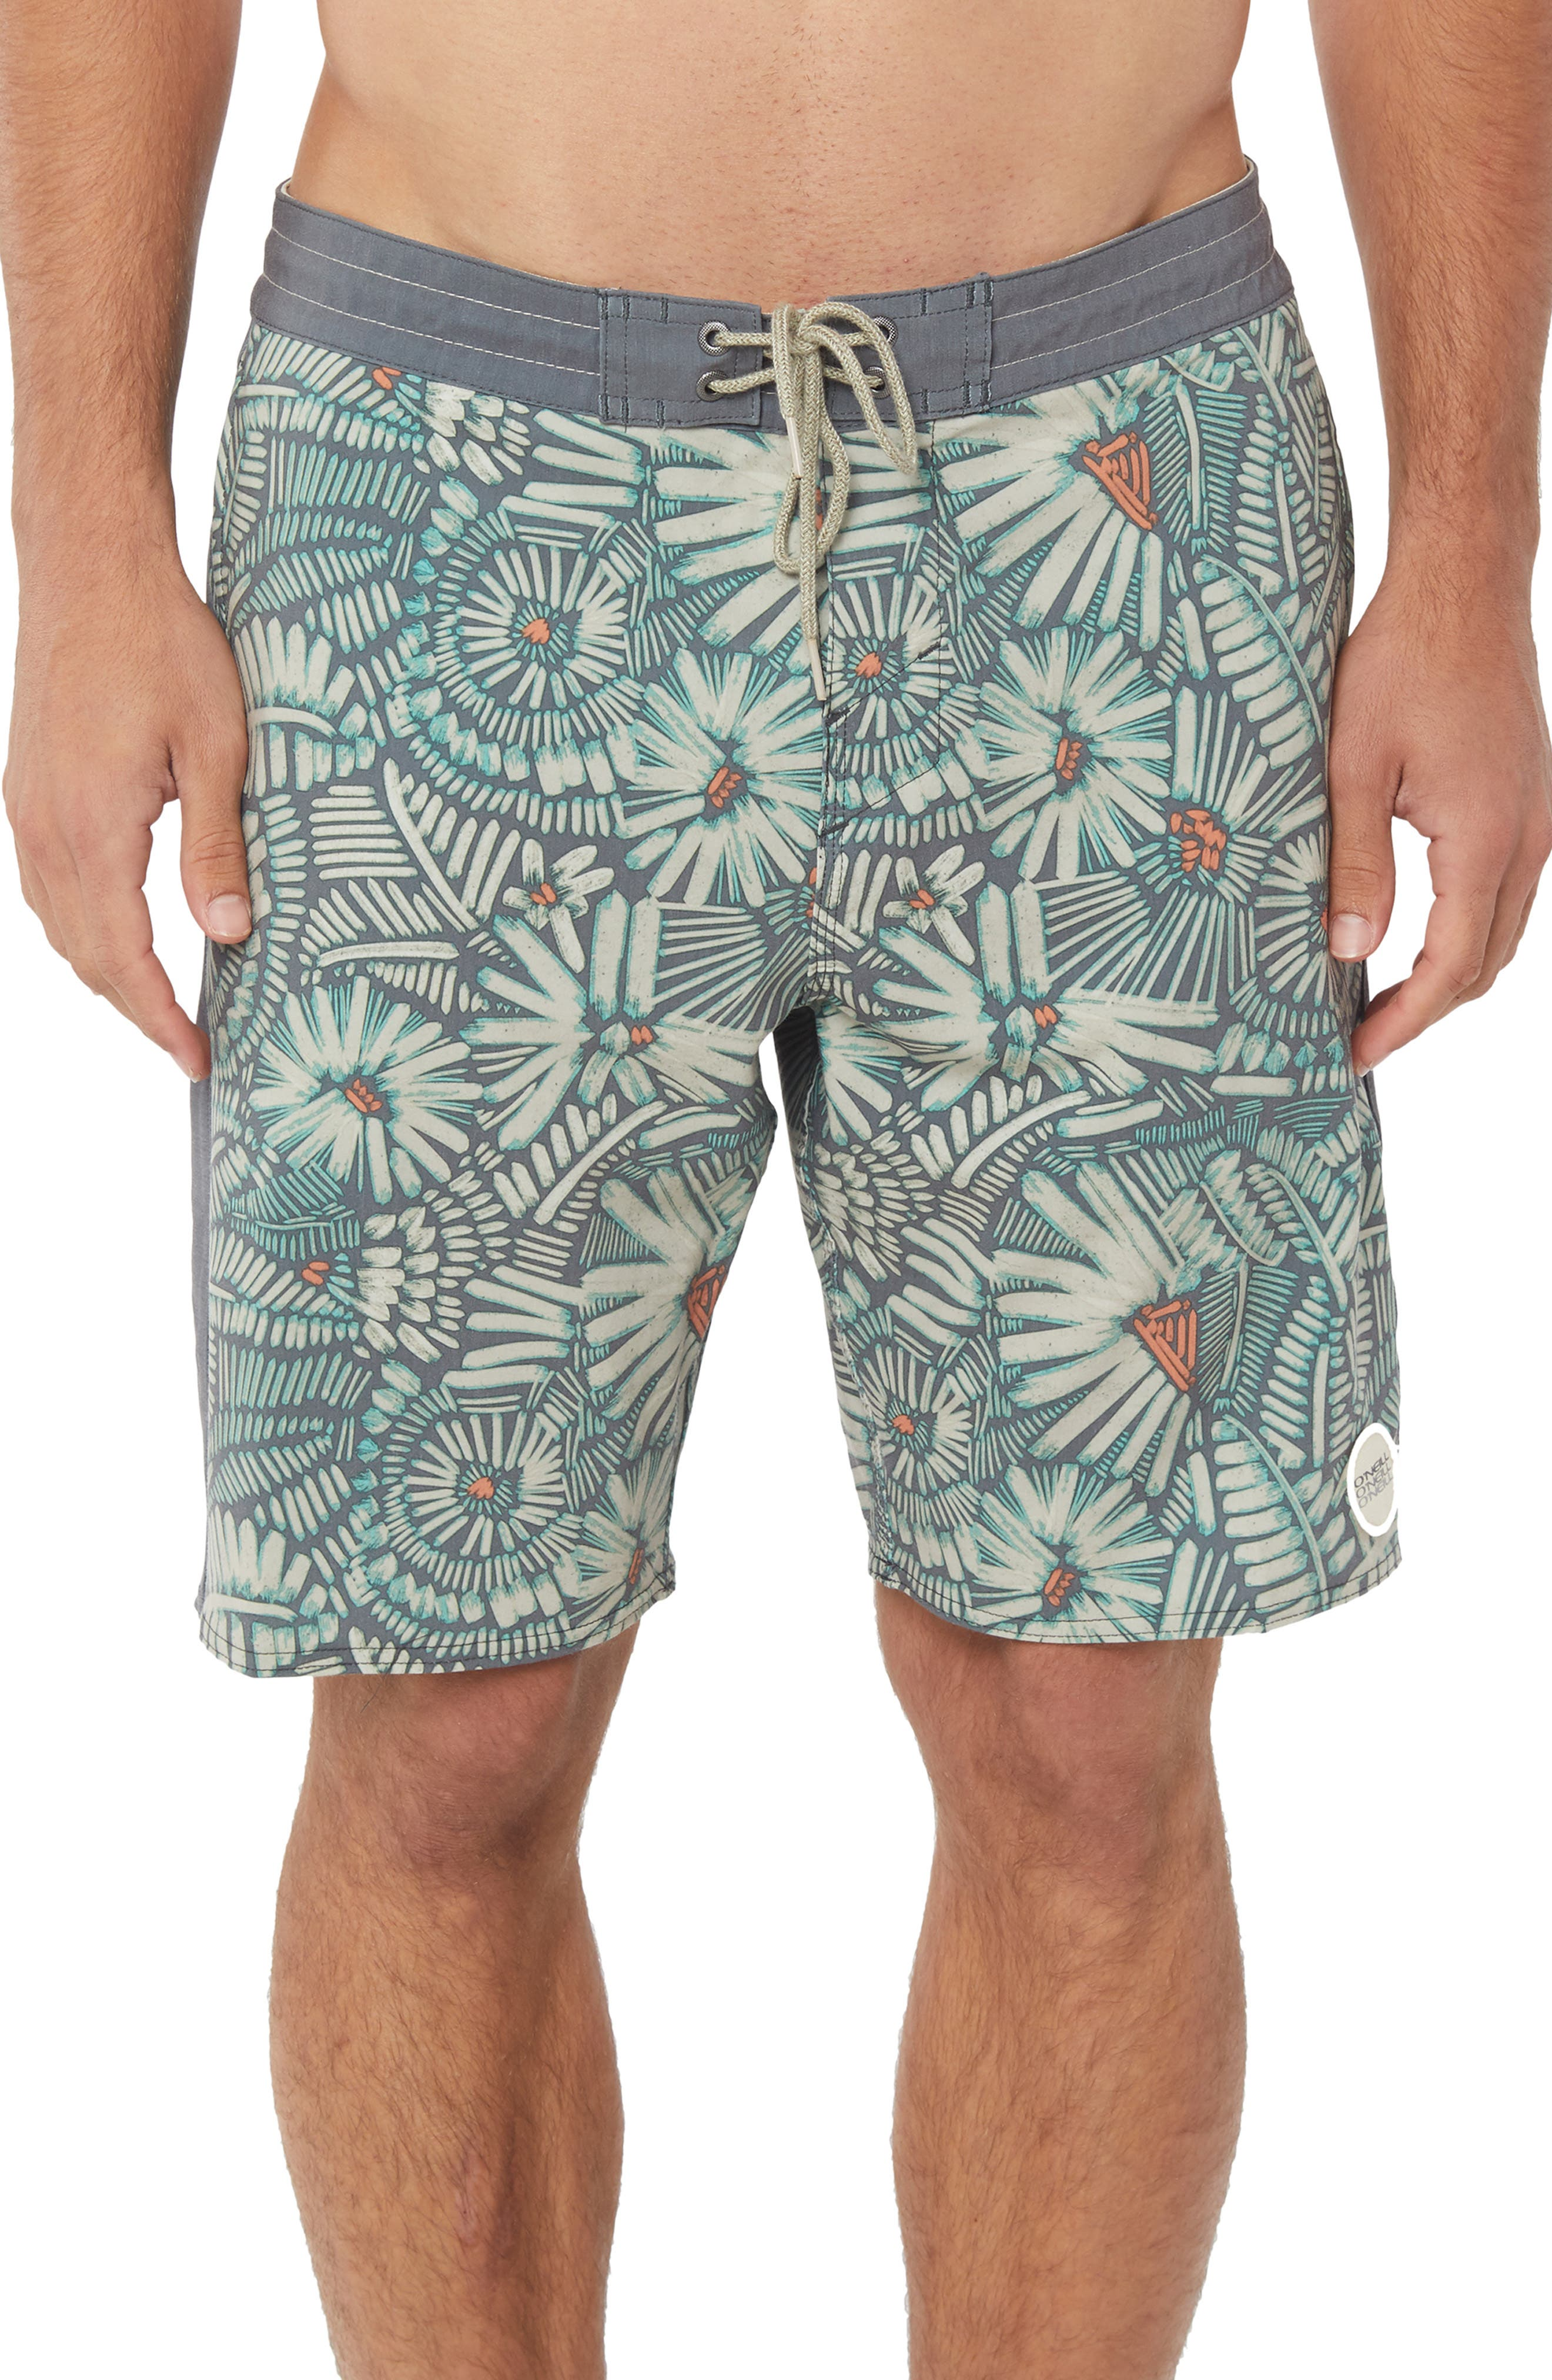 Ditz Guy Cruzer Board Shorts,                             Main thumbnail 1, color,                             AQUARIUS